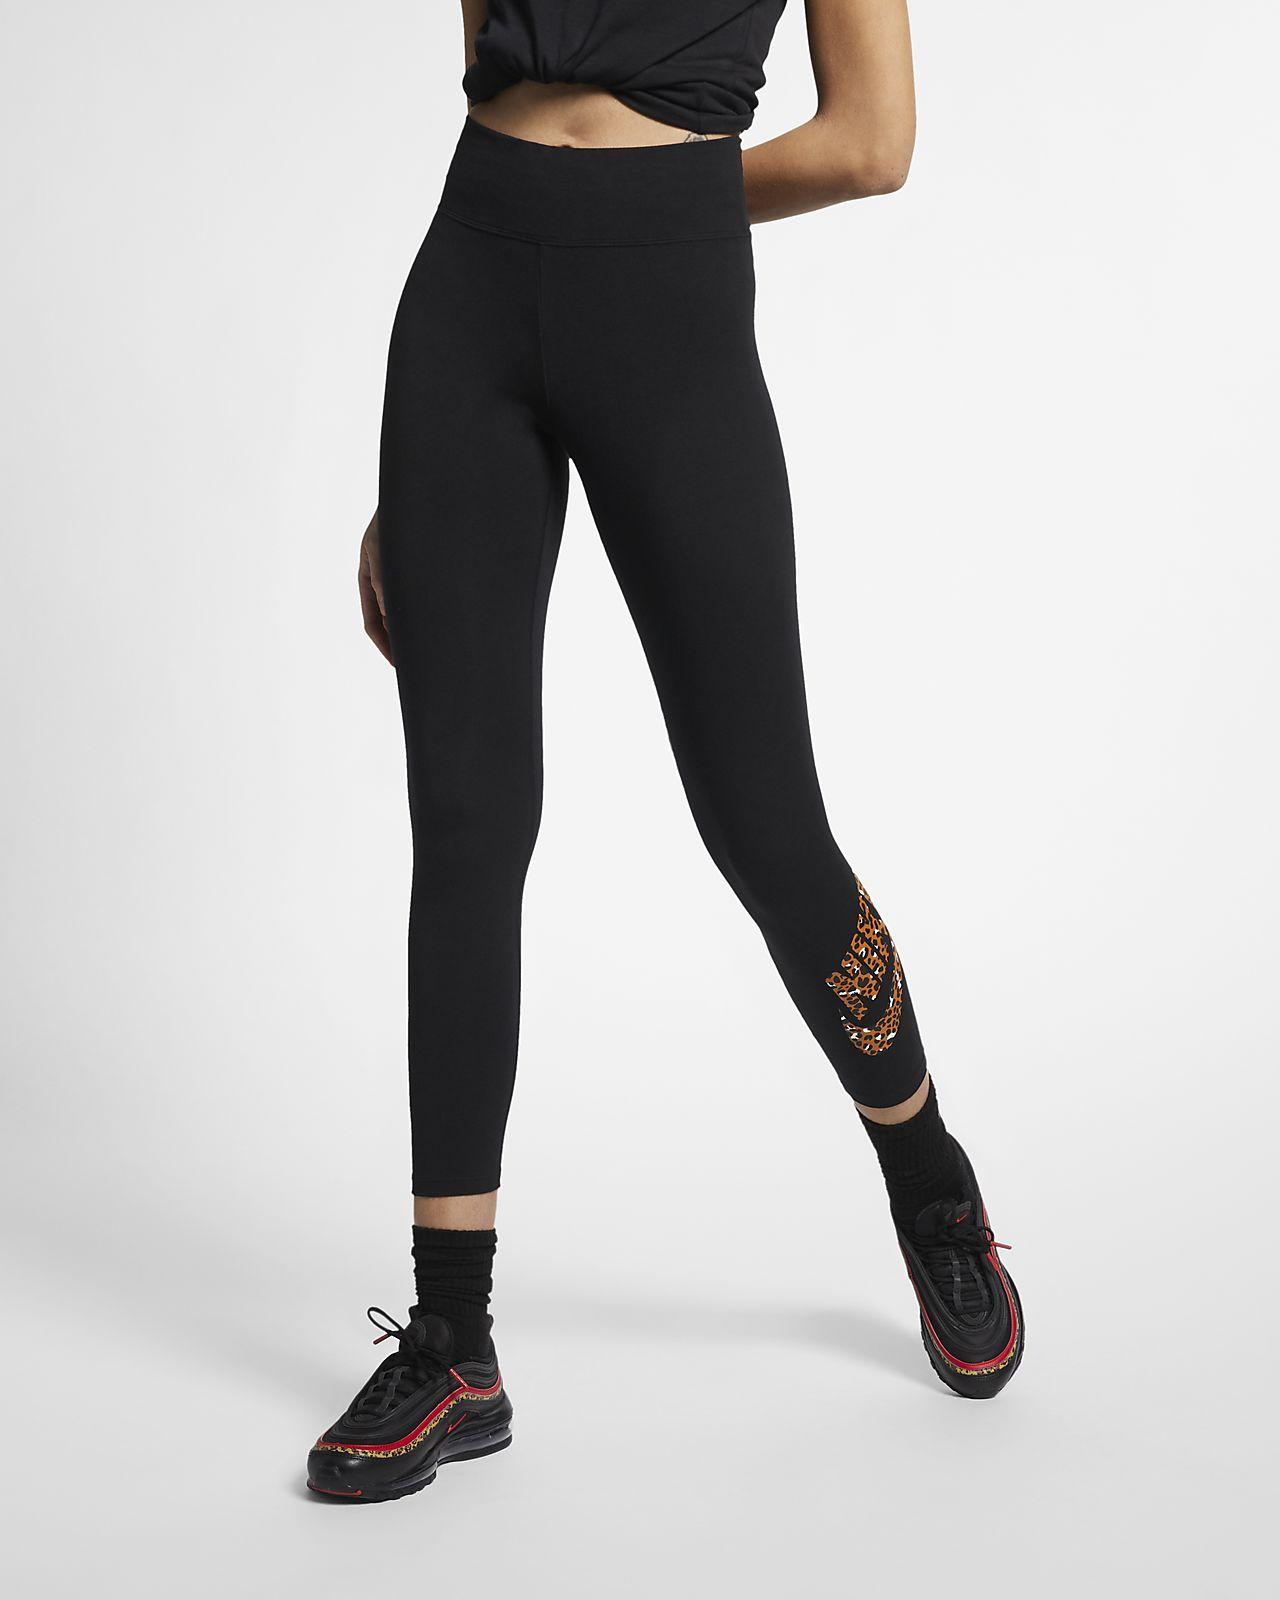 Женские леггинсы Nike Sportswear Animal Print